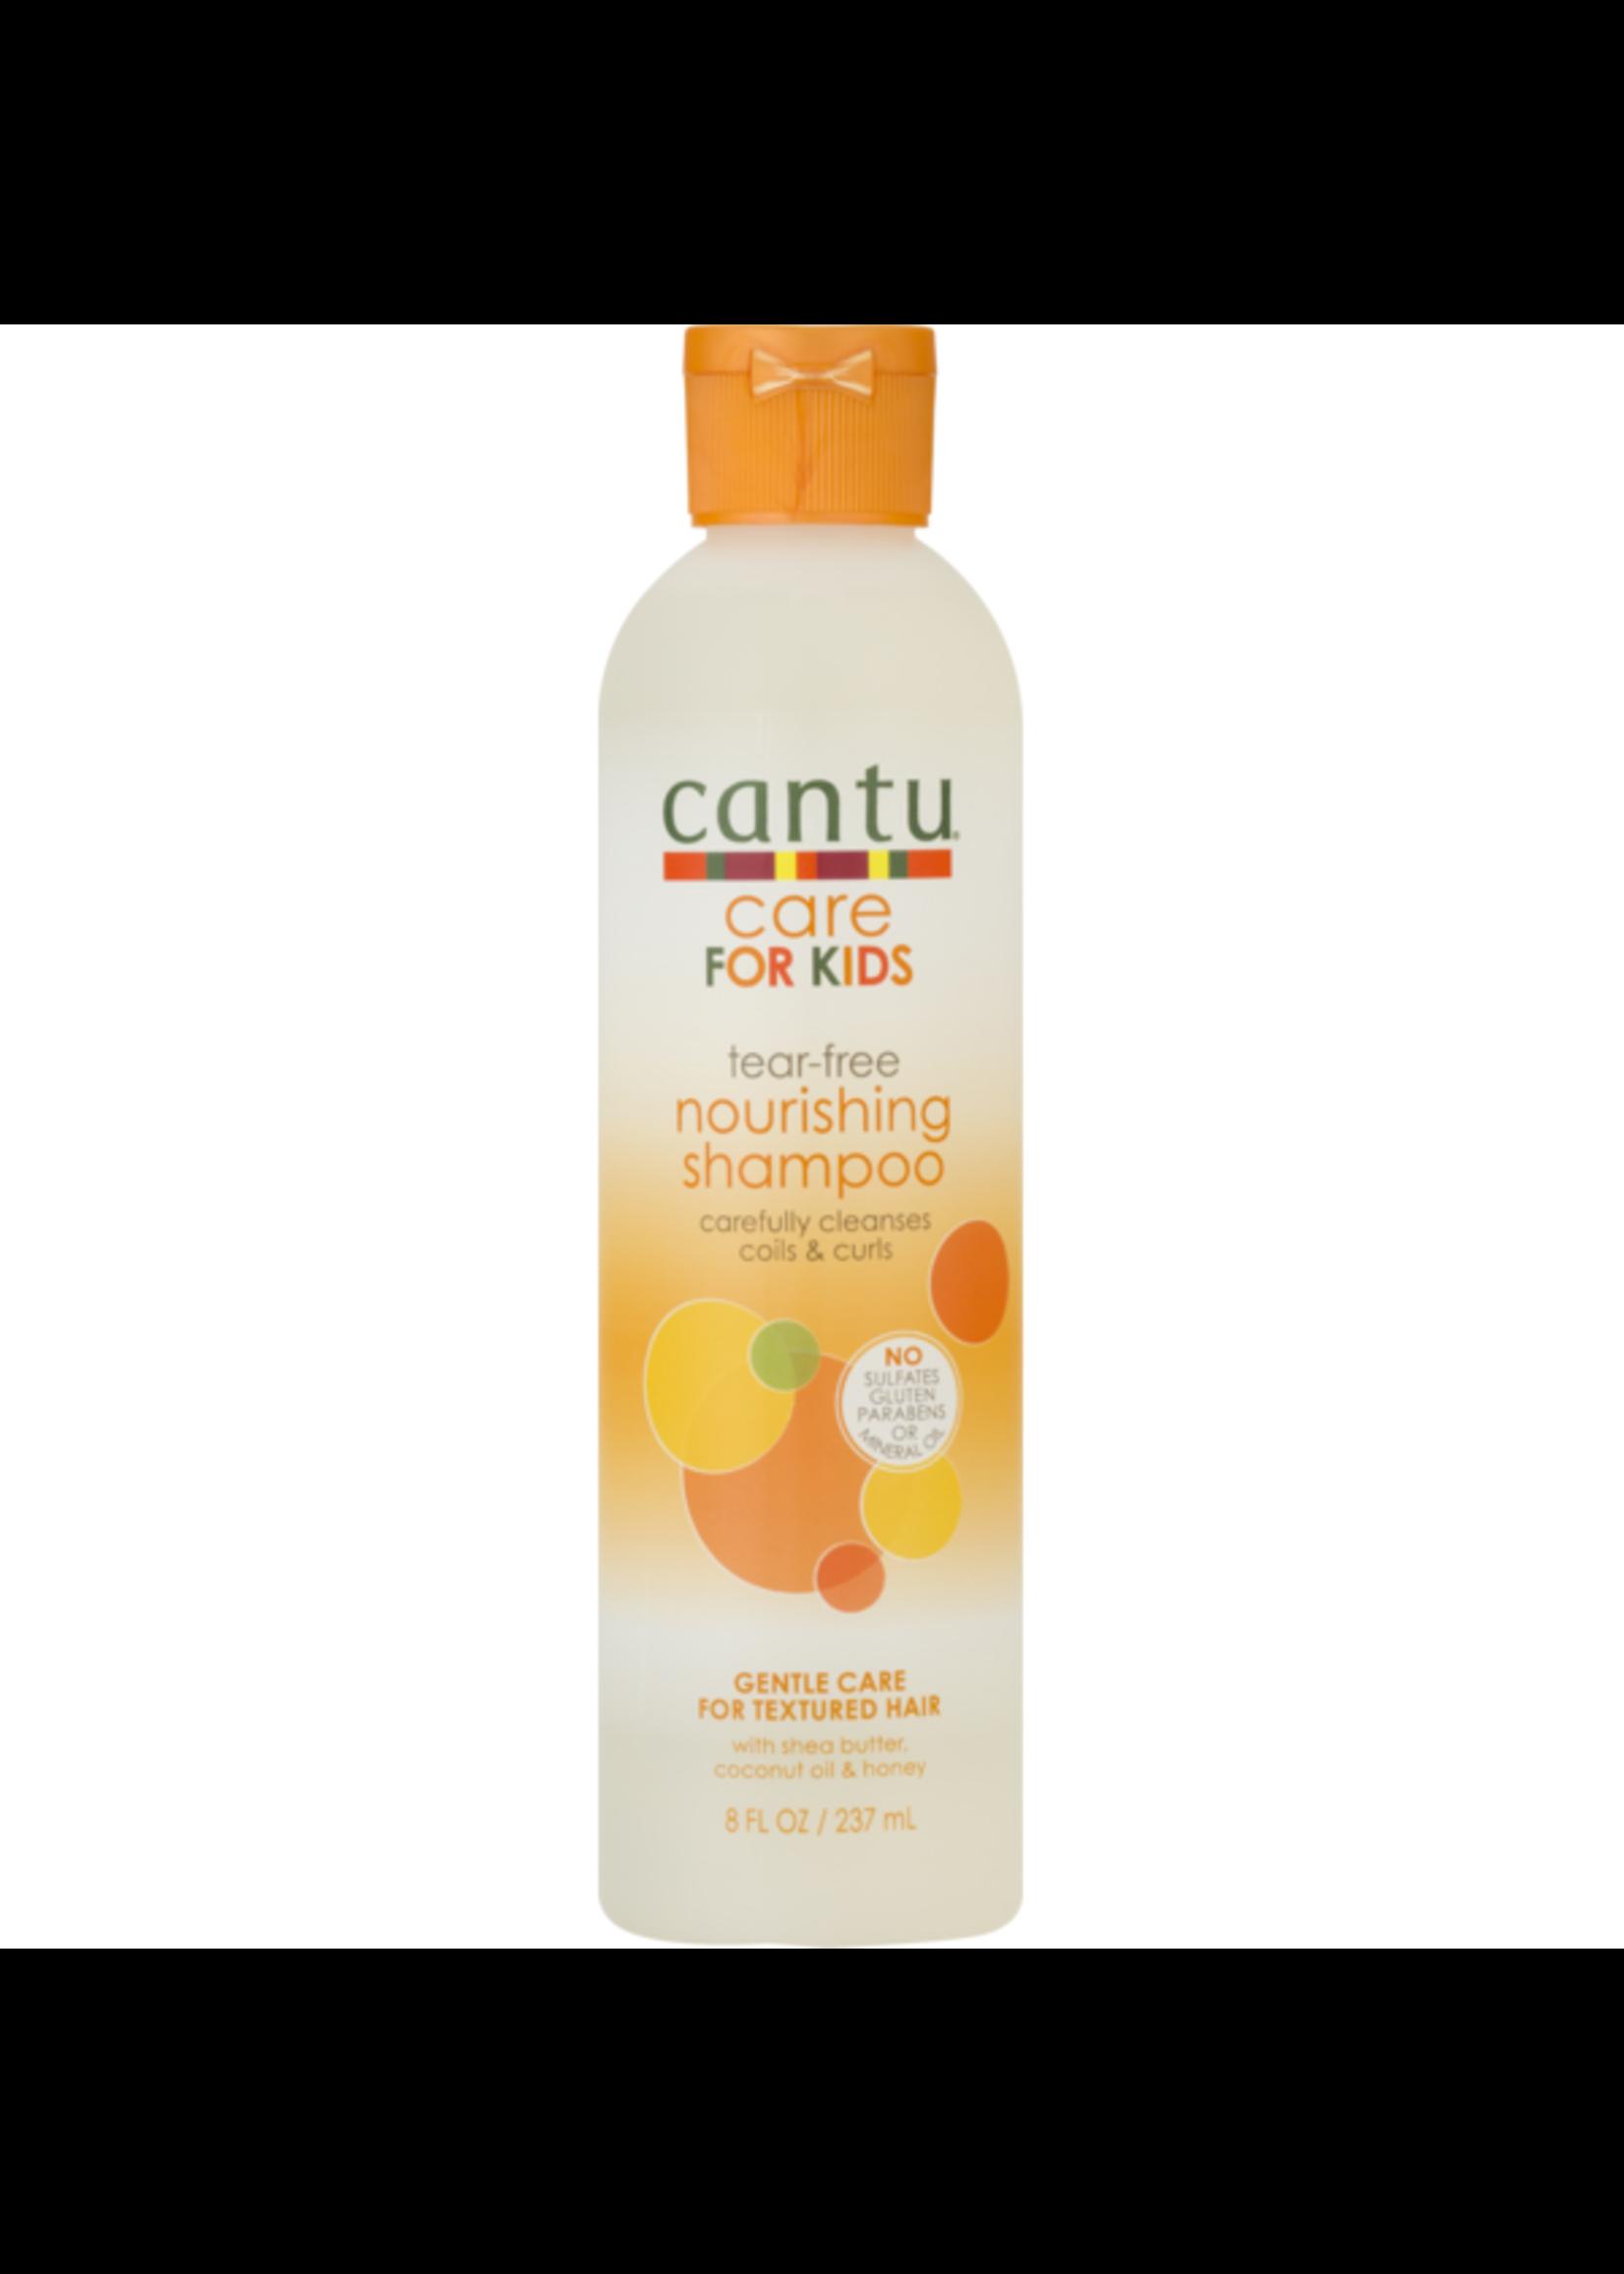 Cantu Care Kid Nourishing Shampoo